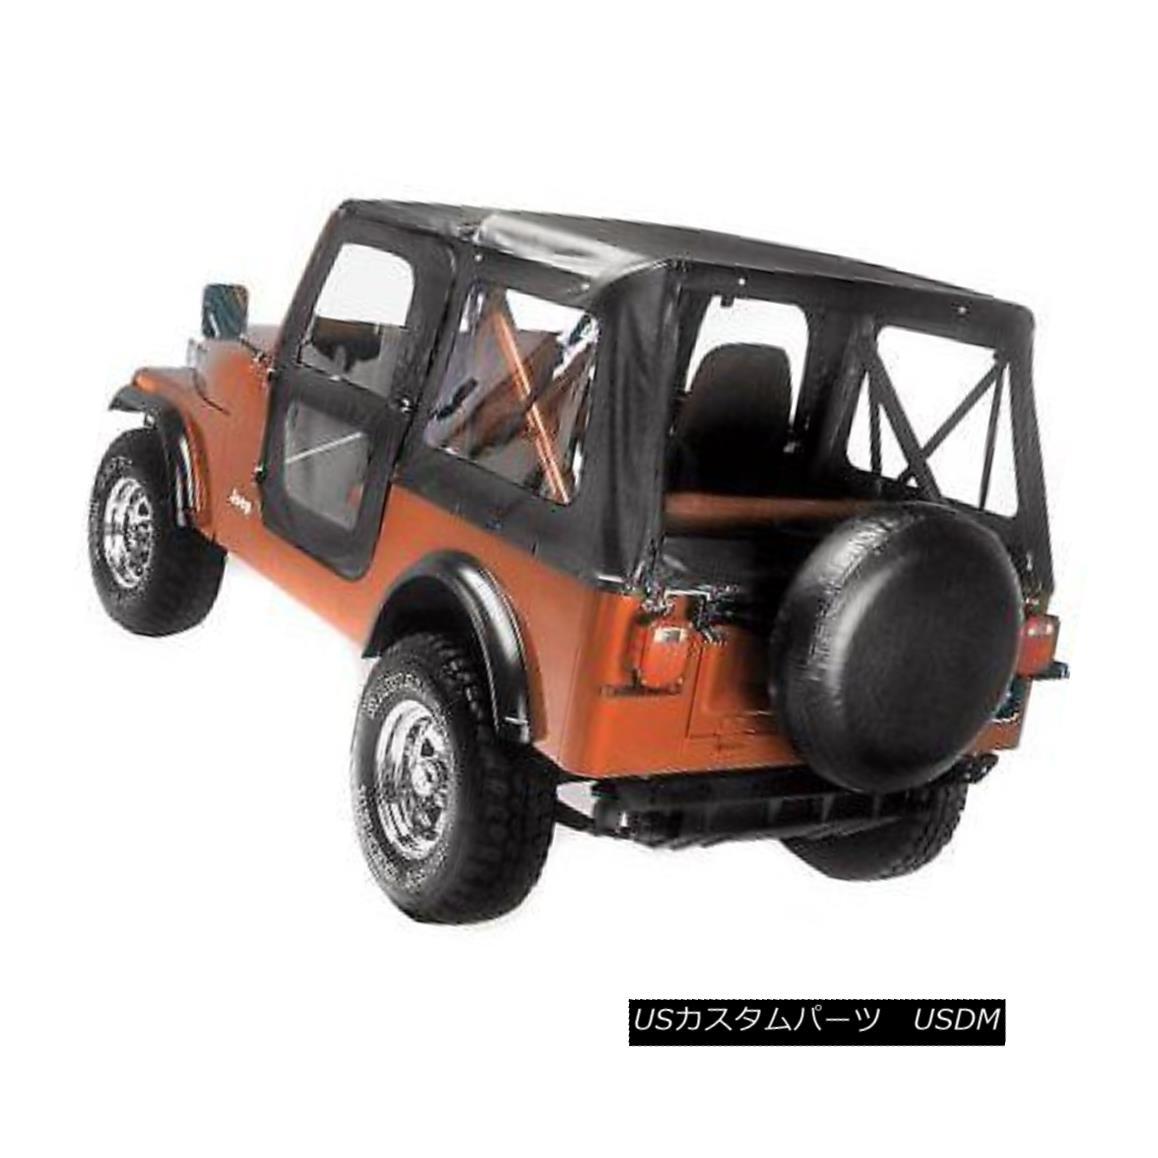 <title>車用品 バイク用品 >> パーツ 外装 エアロパーツ その他 幌 ソフトトップ Bestop New Soft Top Black Jeep 秀逸 CJ5 1976-1983 ベストトップ新ソフトトップブラックジープCJ5</title>